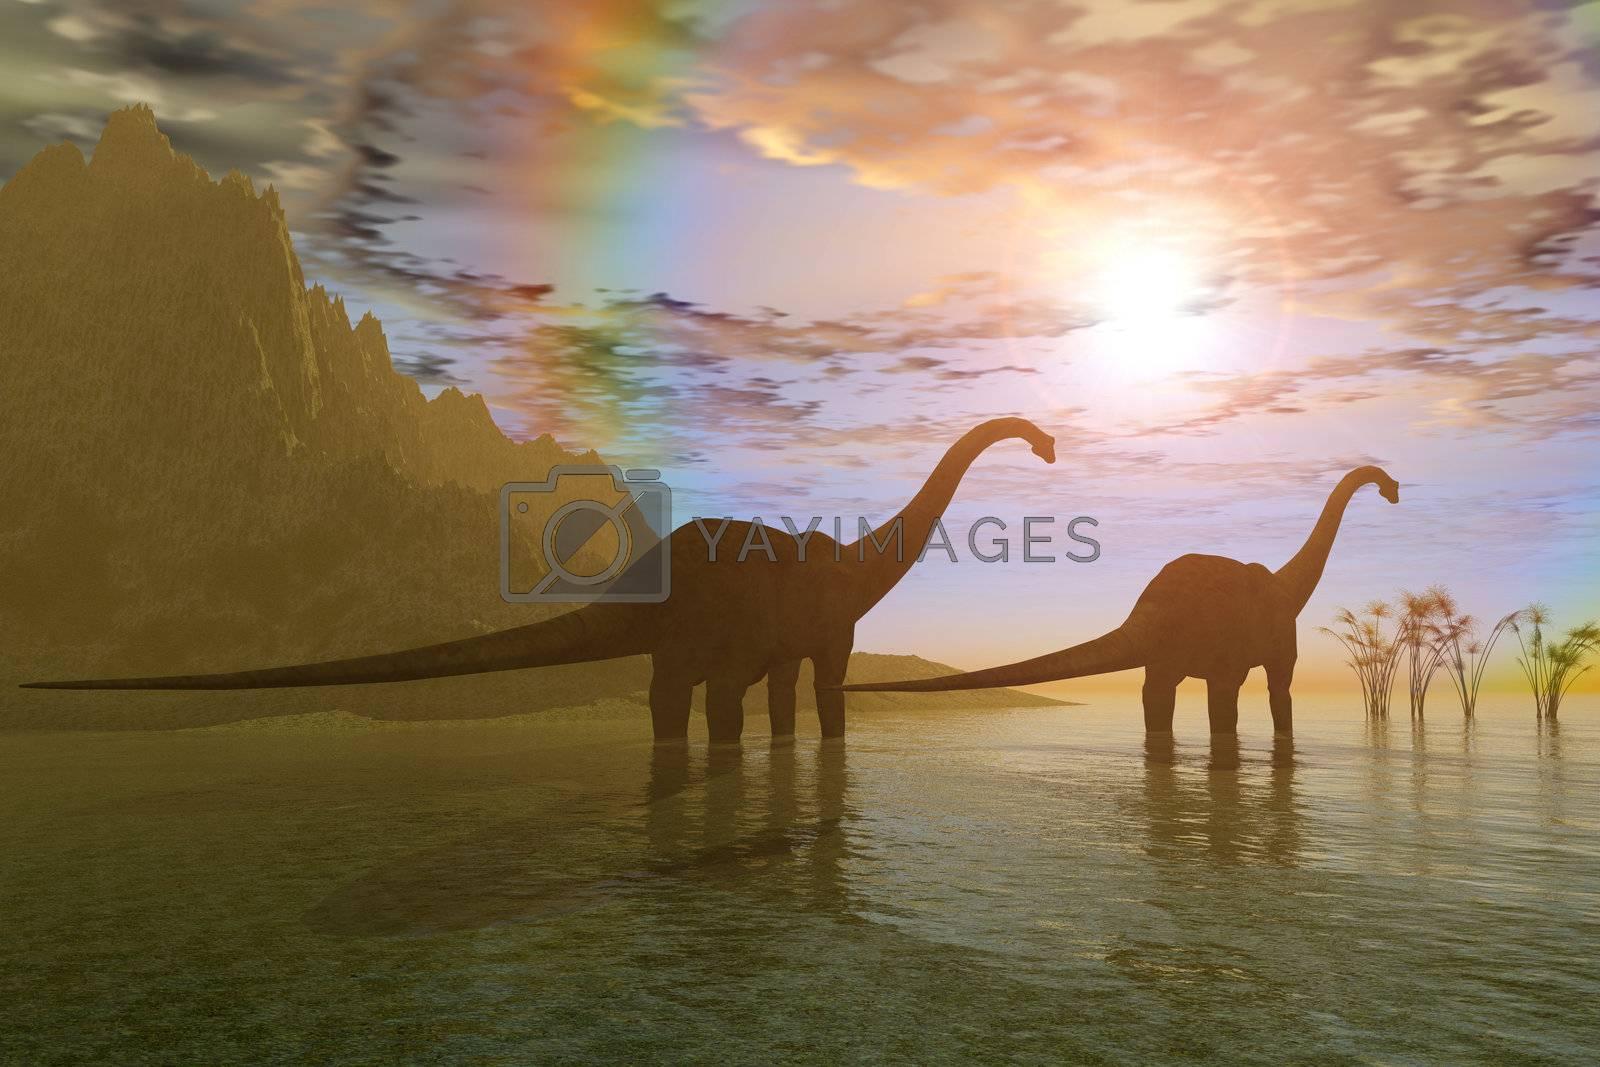 Two Diplodocus dinosaurs wade through shallow water to eat some vegetation.